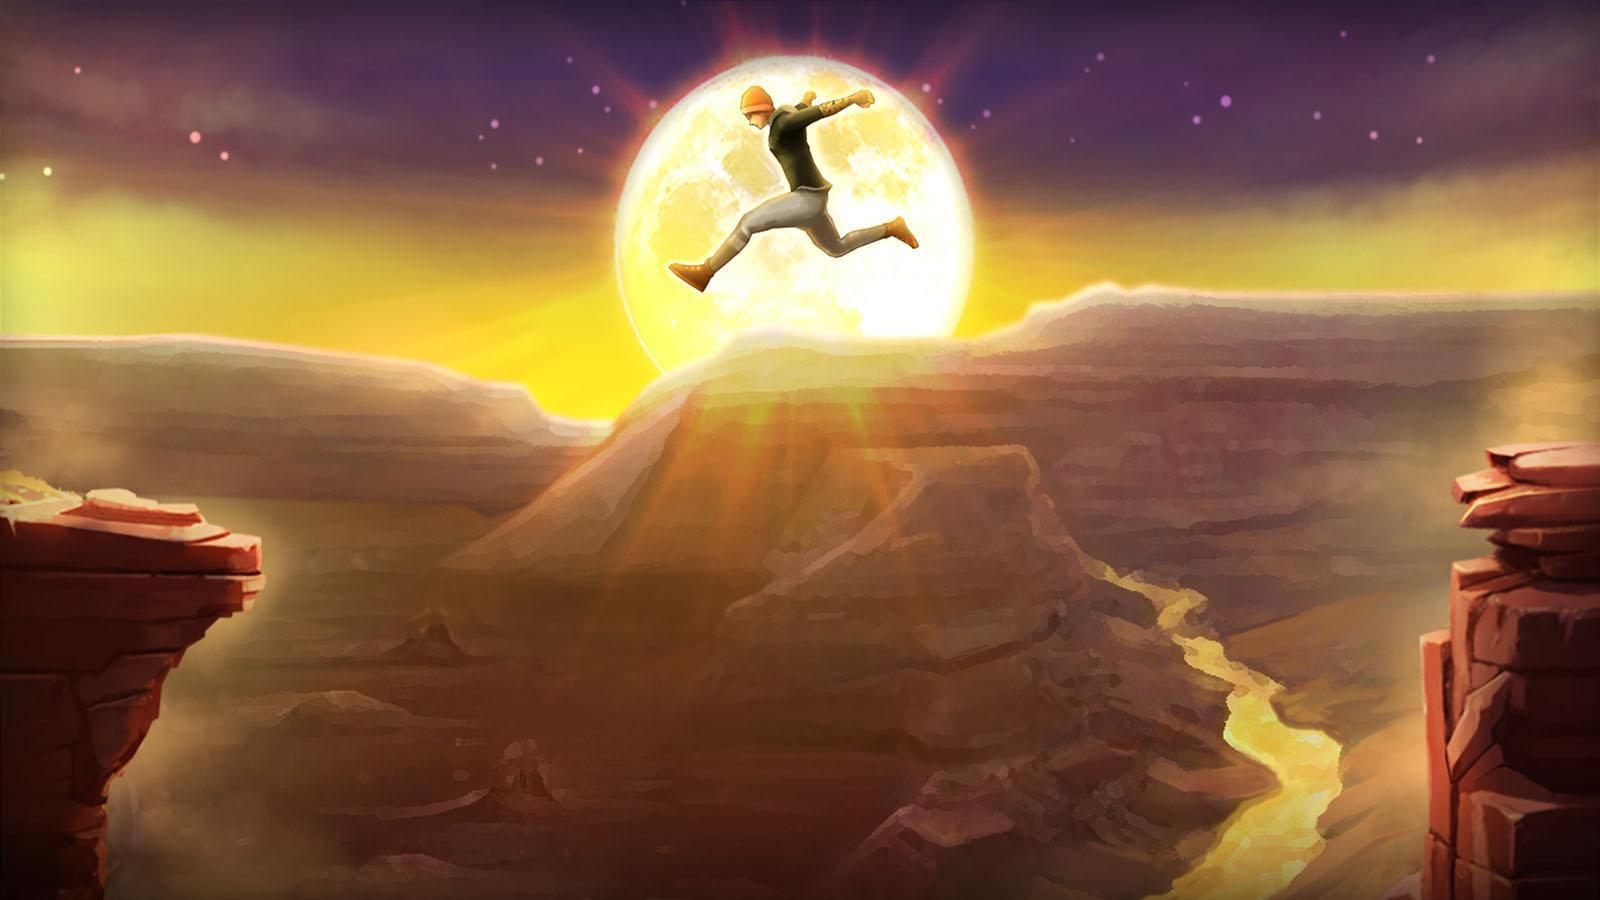 Sky Dancer Run - Running Game 4.2.0 Screenshot 1